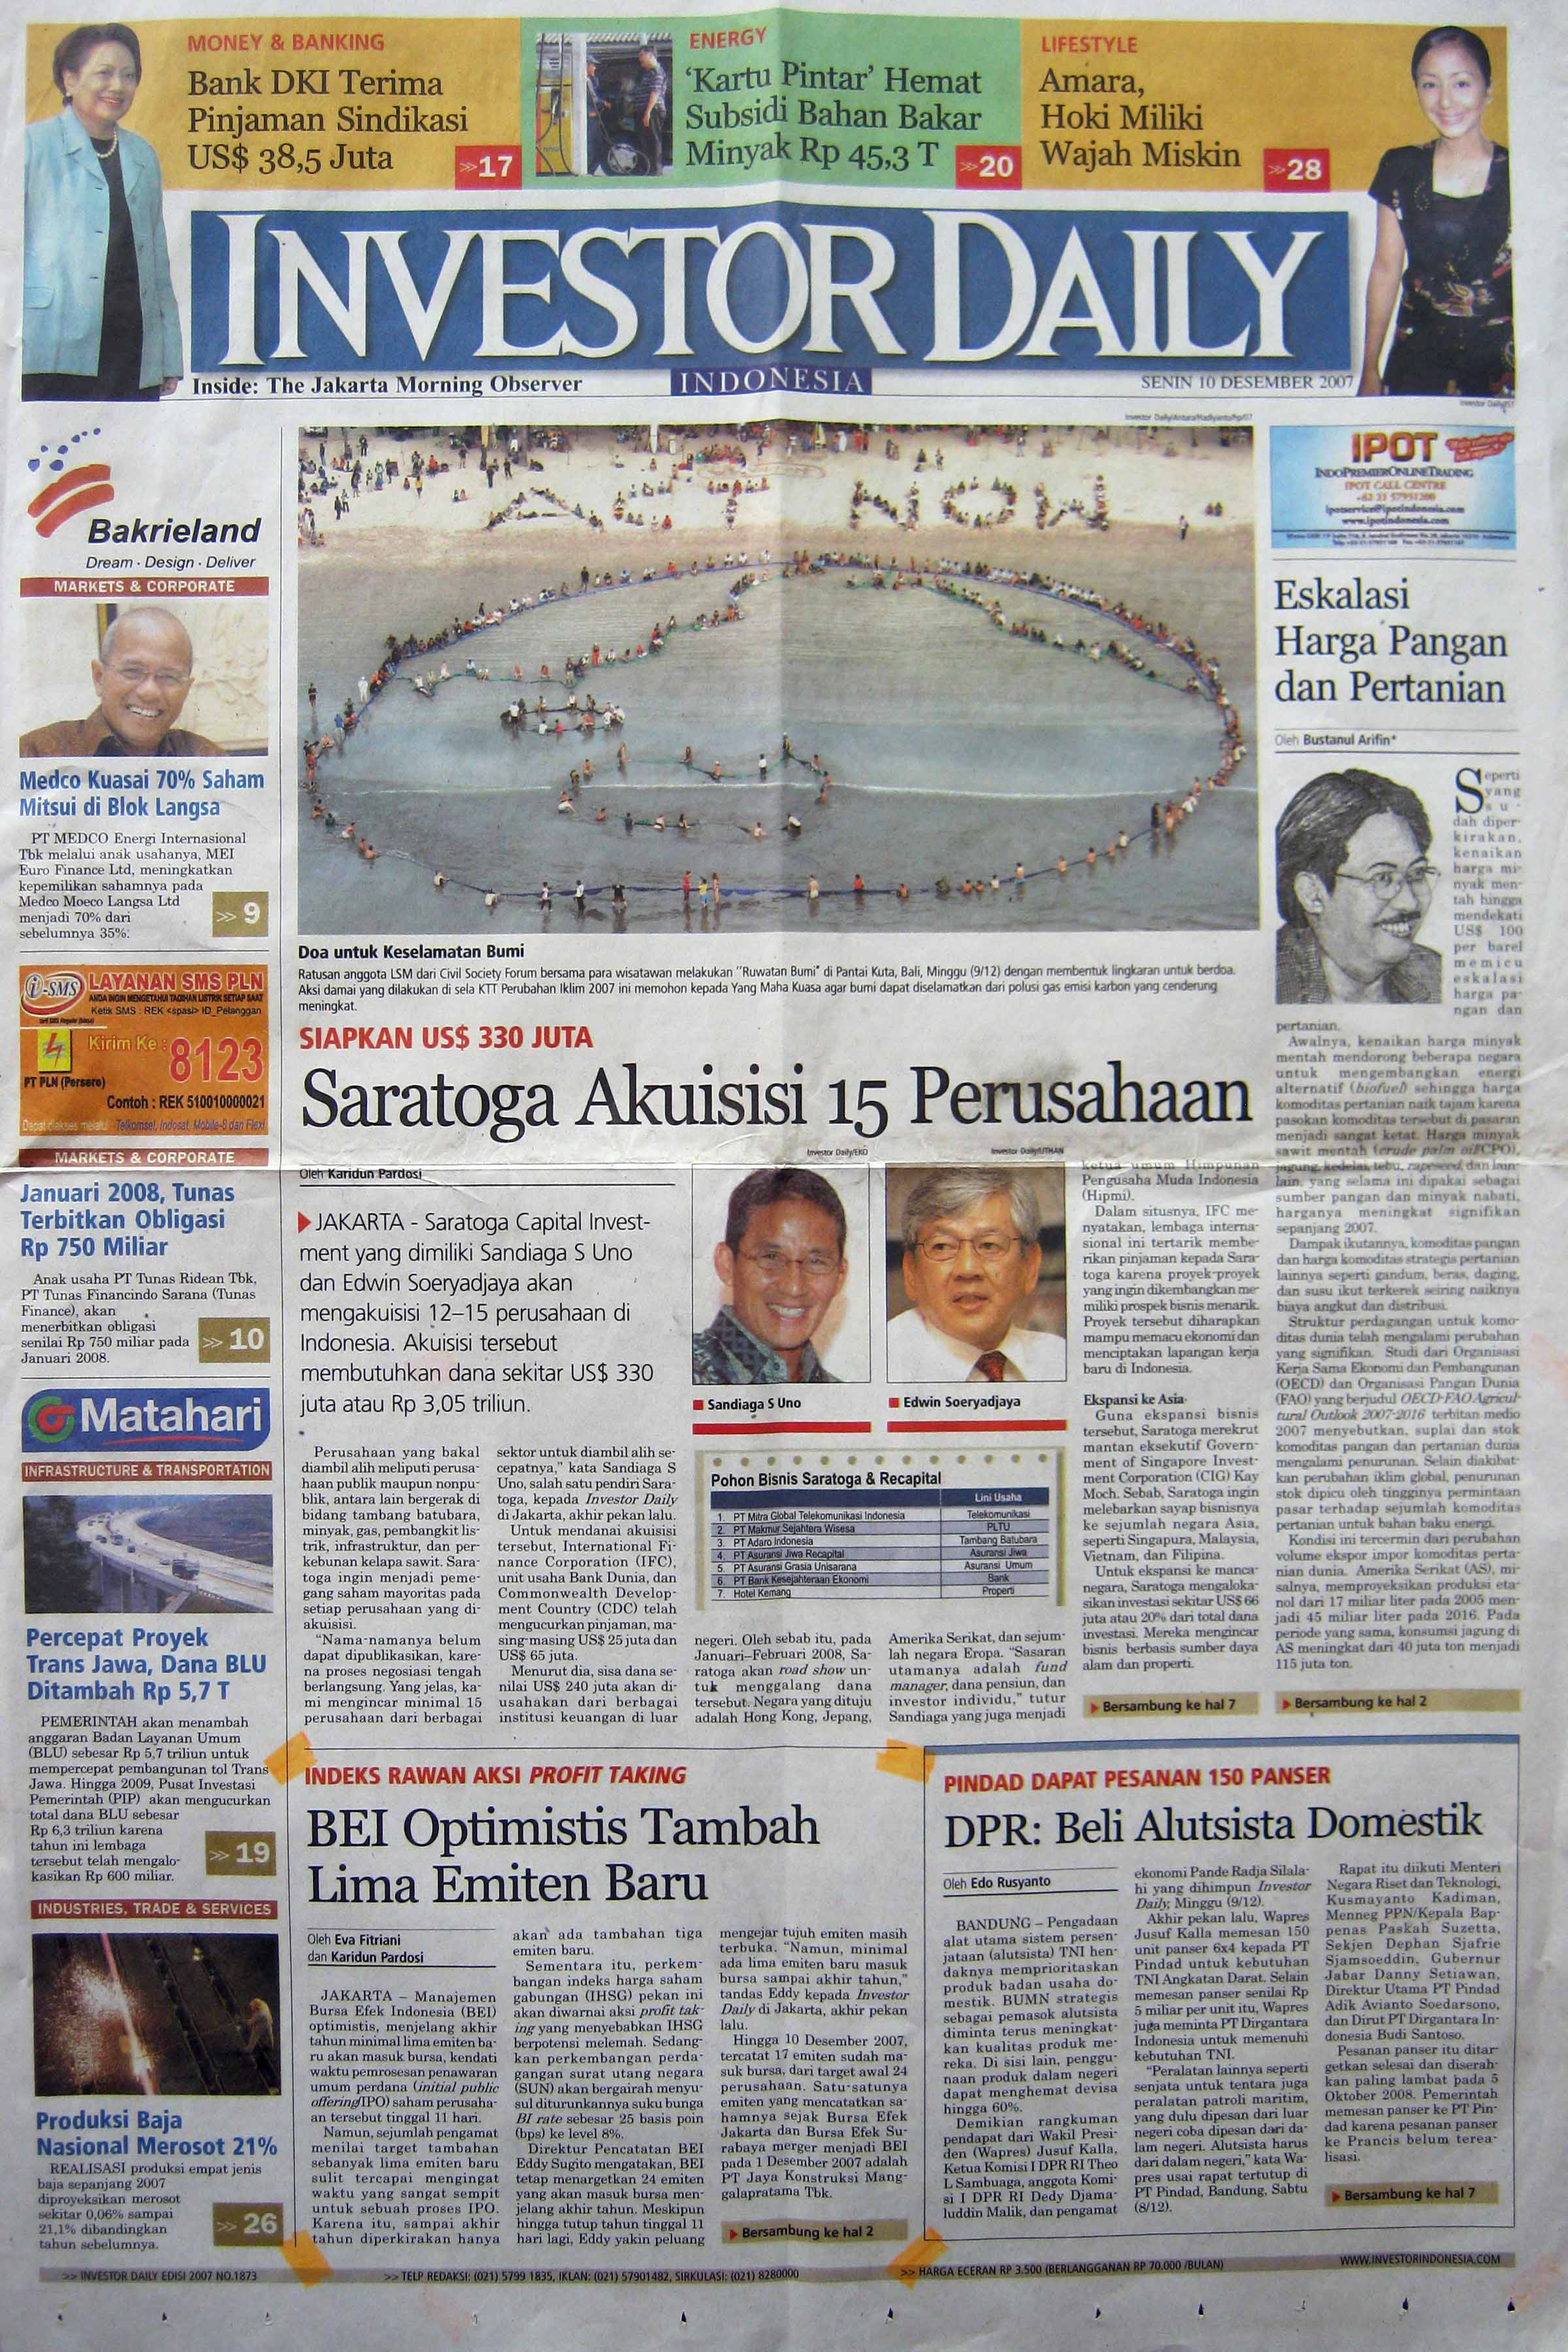 10. 10 Desember 2007 - BEI Optimistis Tambah Lima Emiten  Baru